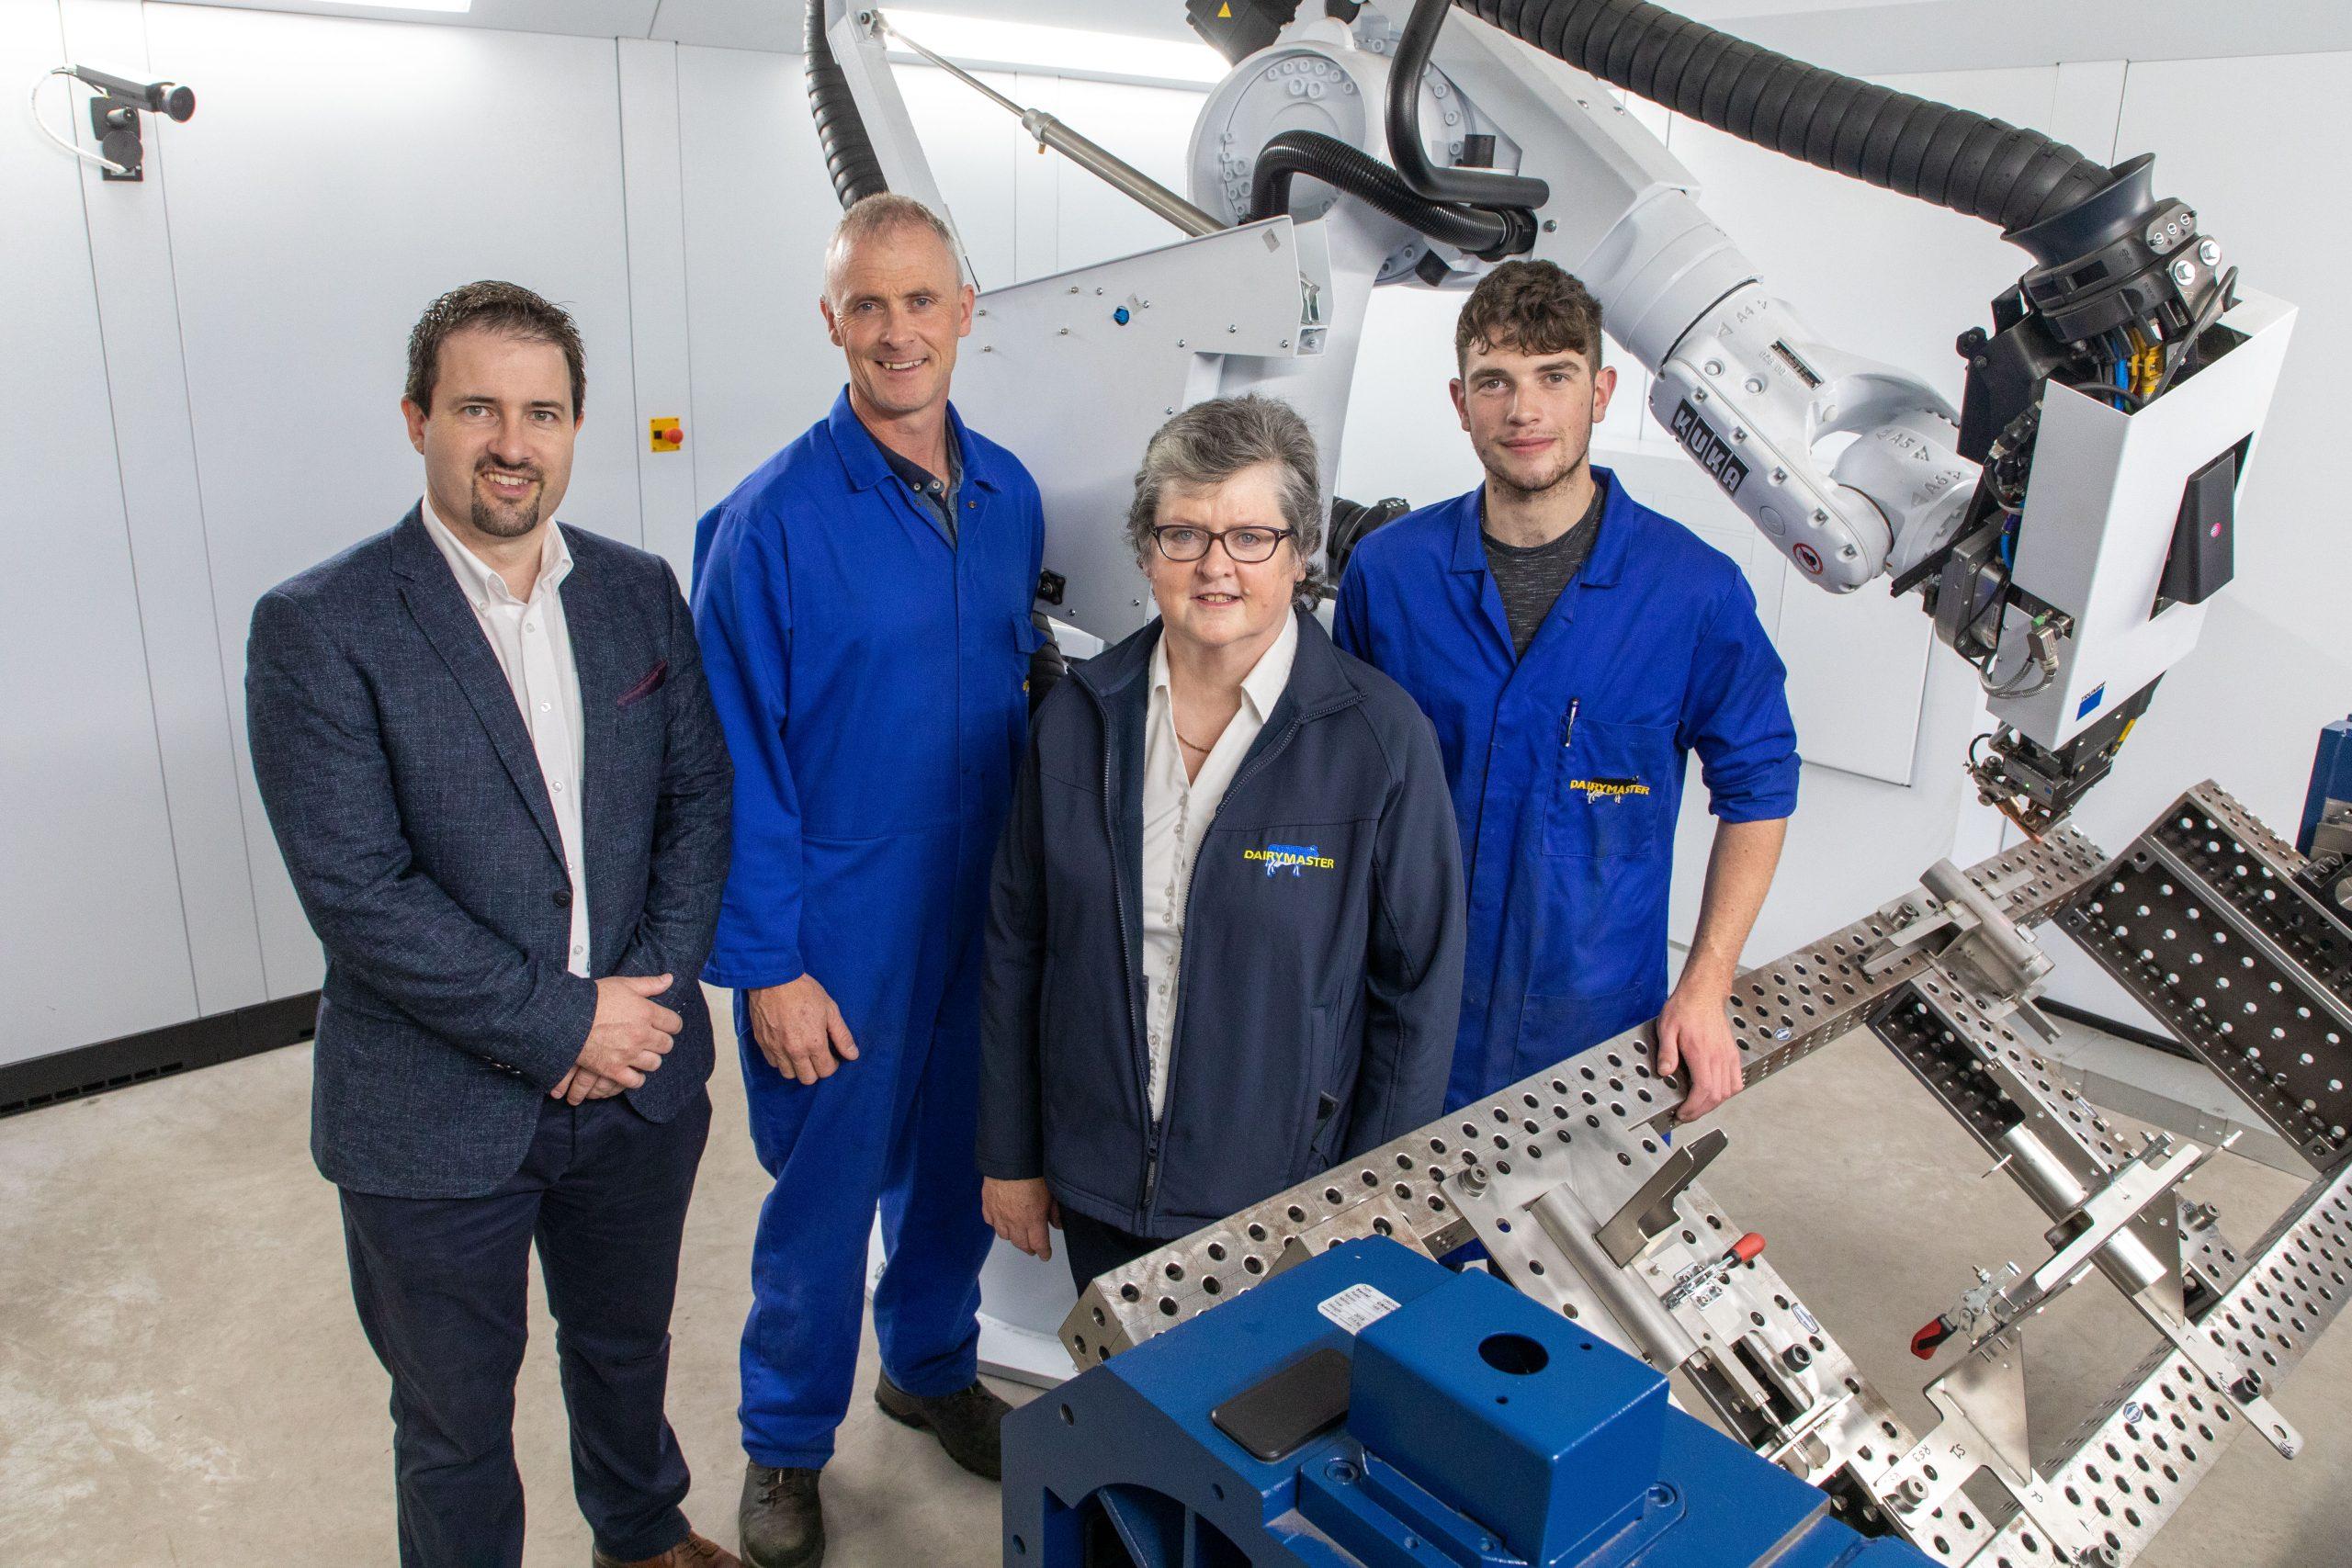 Dairymaster are recruiting L-R John Harty, Alan Murphy, Breda Flaherty, David Lynch, Dairymaster